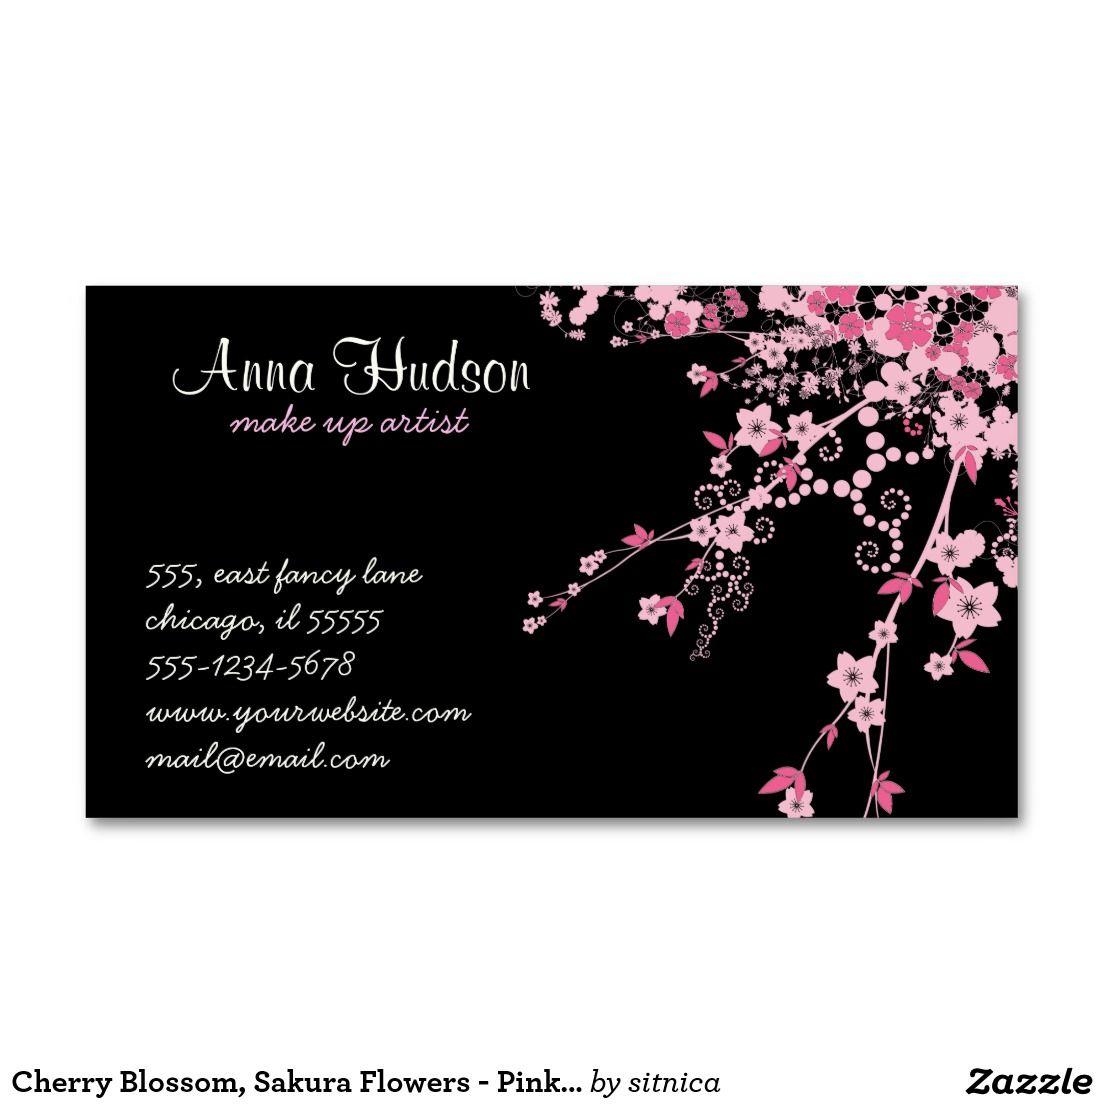 Cherry Blossom, Sakura Flowers - Pink Black Business Card | Black ...